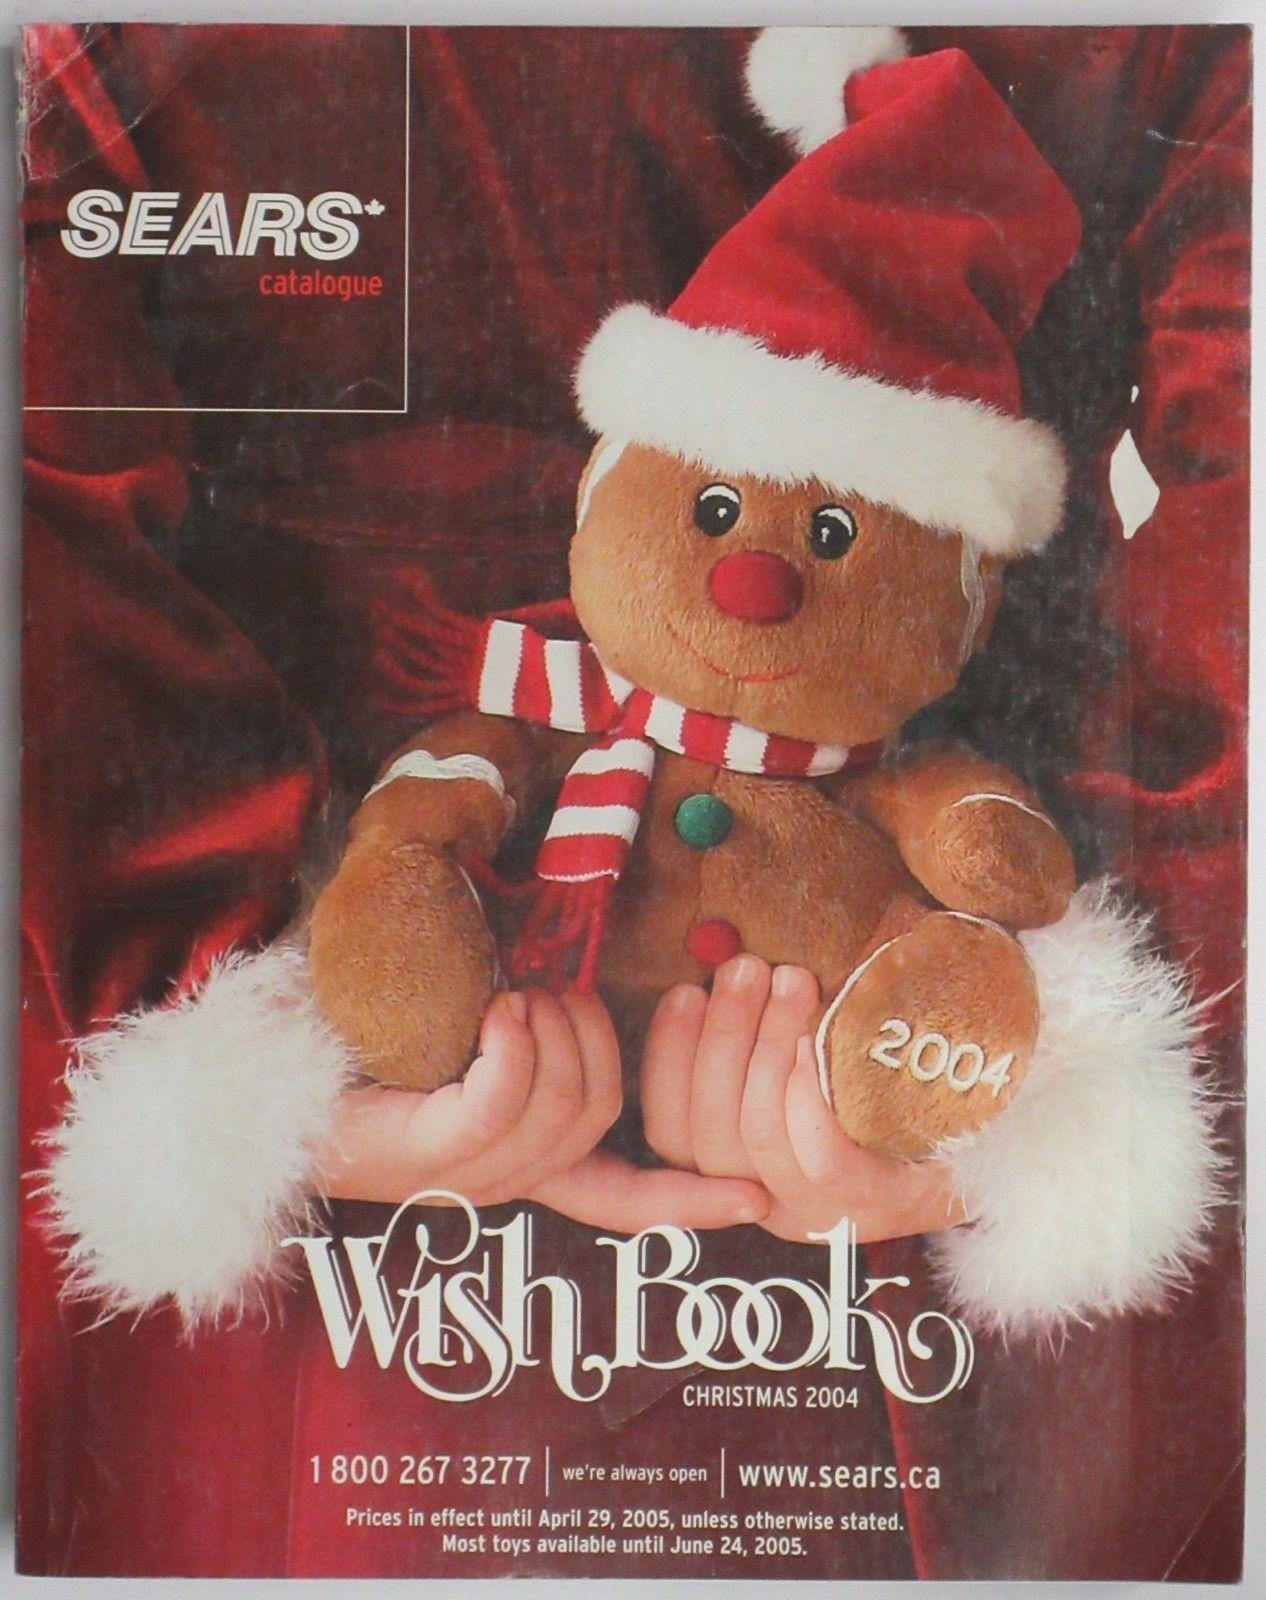 2004 Sears Wish Book WishBook Christmas Catalog | eBay